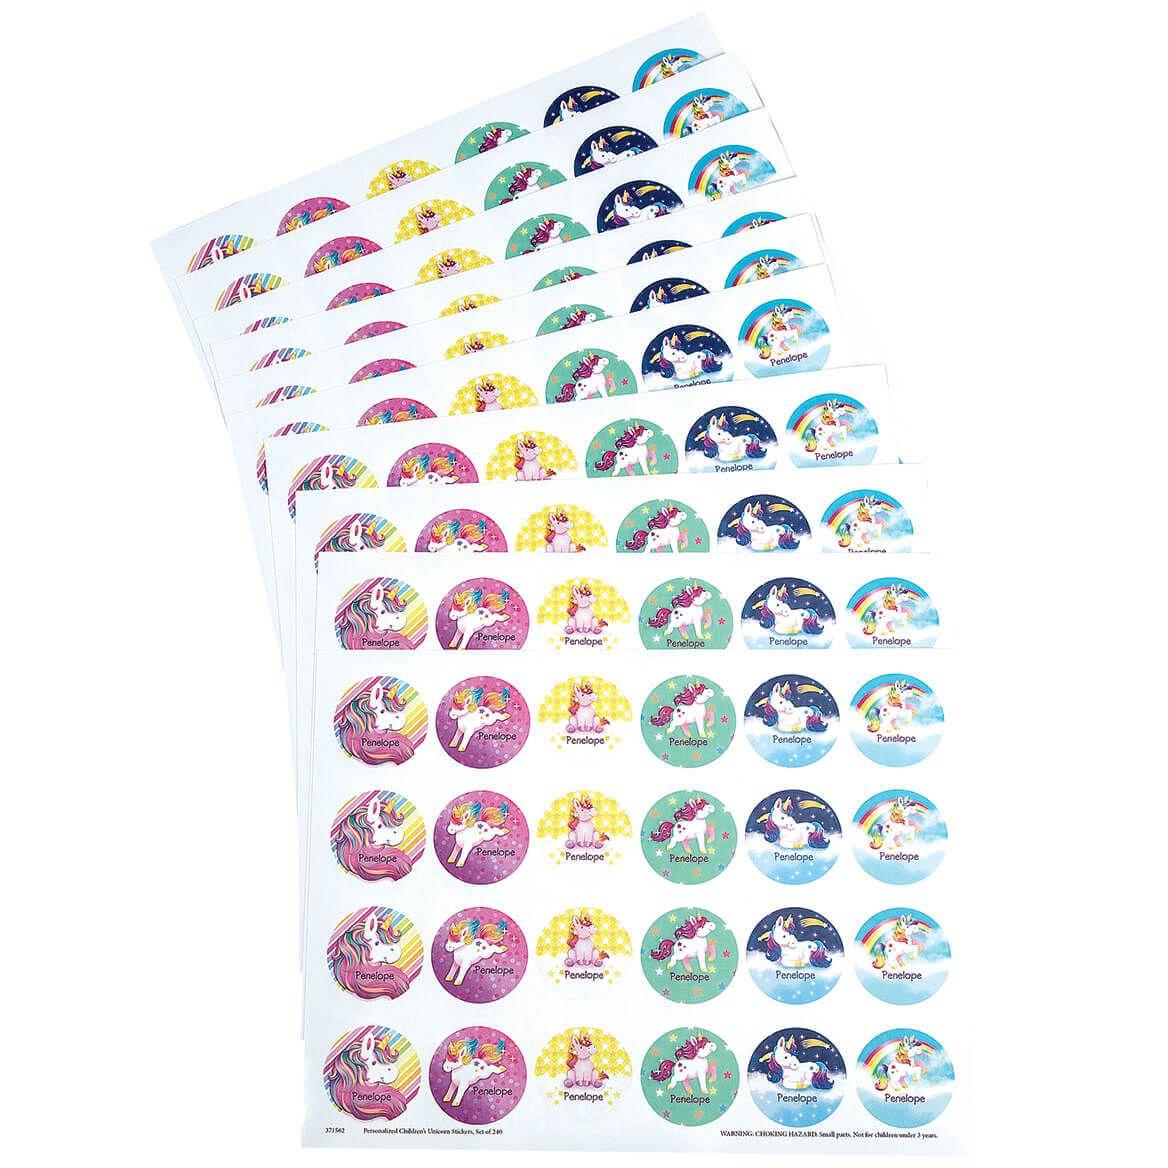 Personalized Children's Unicorn Stickers, Set of 240-371562